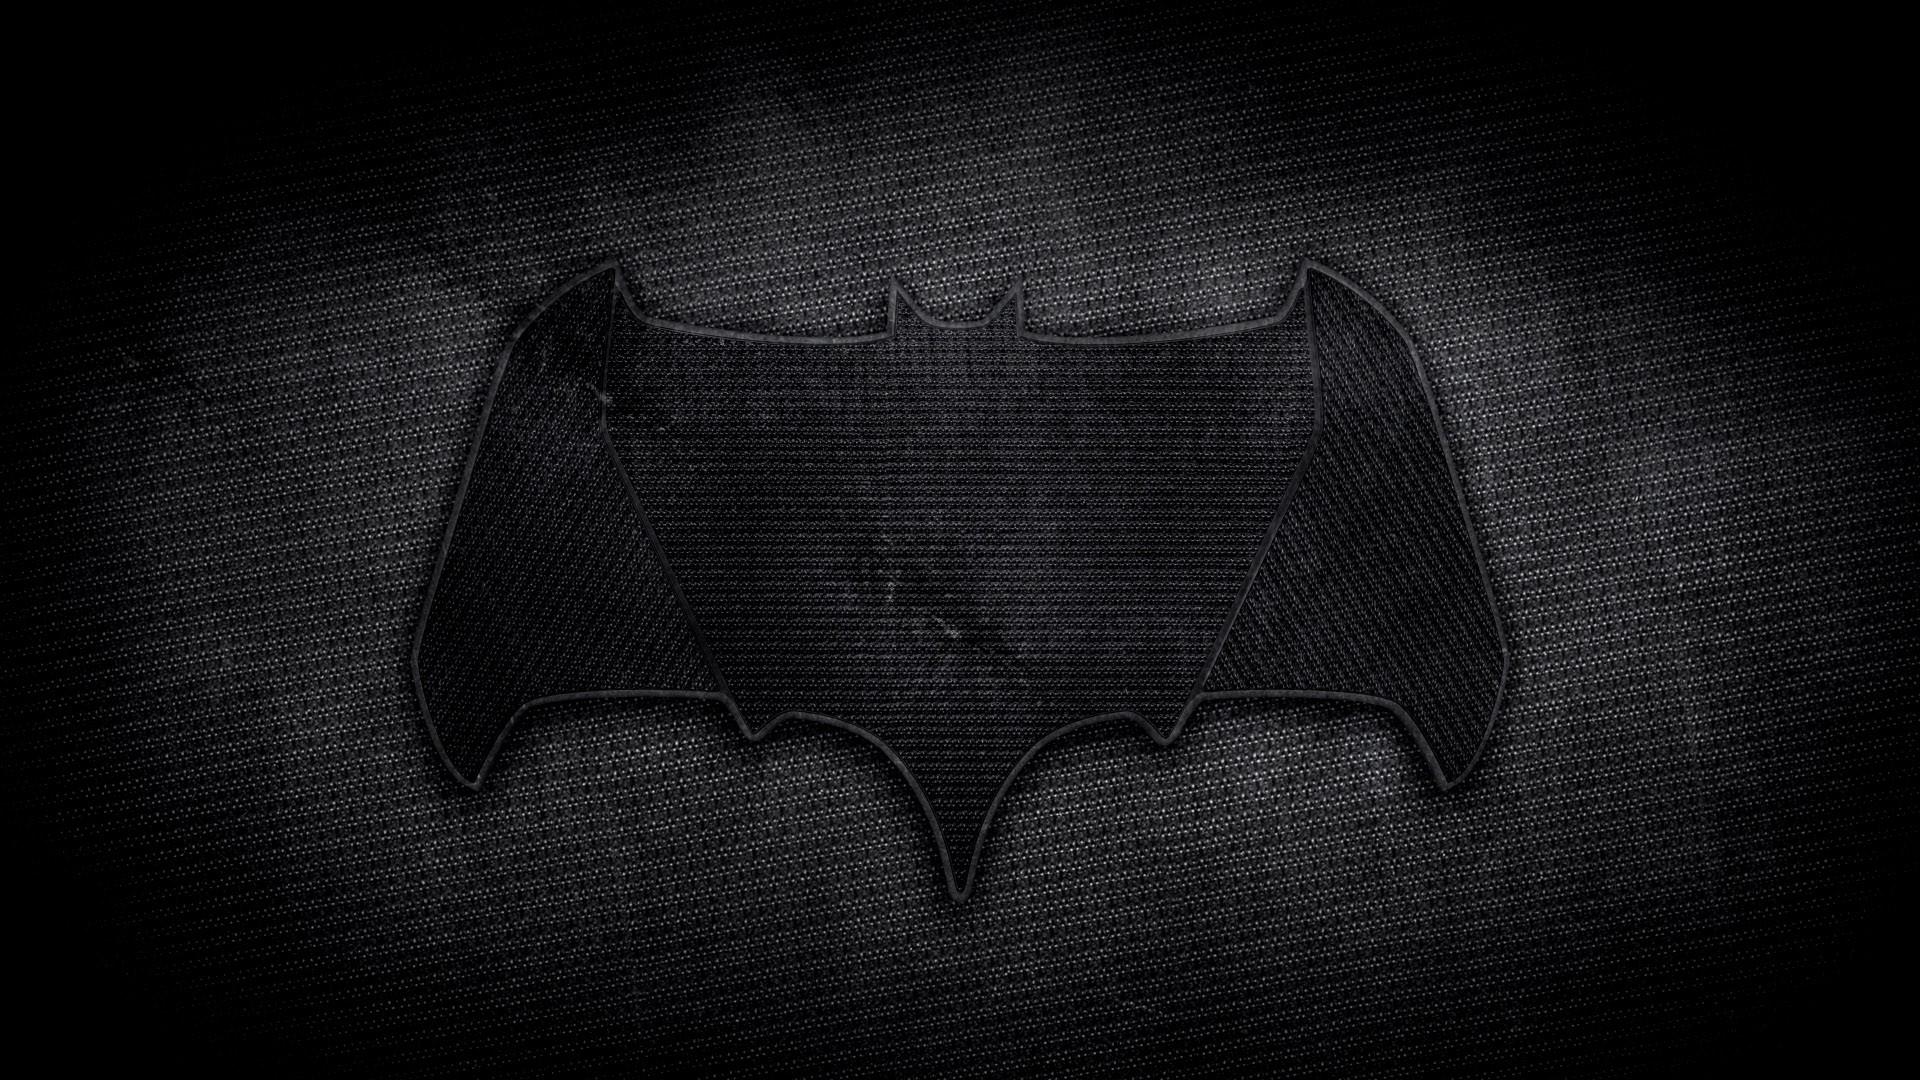 1920x1080 Large Batman Logo Wallpaper Download Amazing